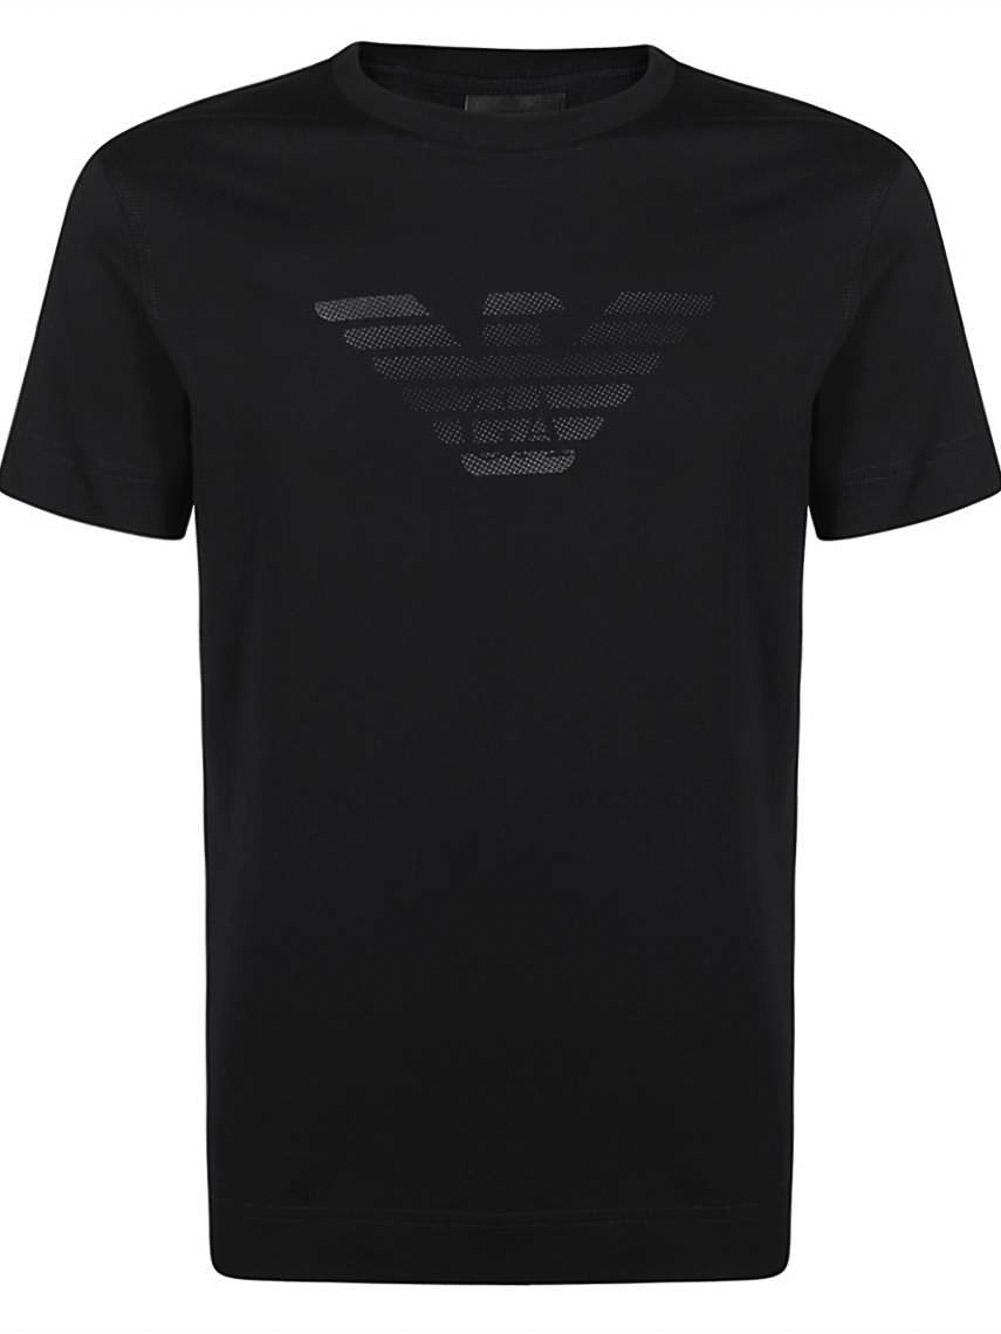 EMPORIO ARMANI Μπλούζα t-shirt 3K1TE61JSHZ-0920 ΜΠΛΕ